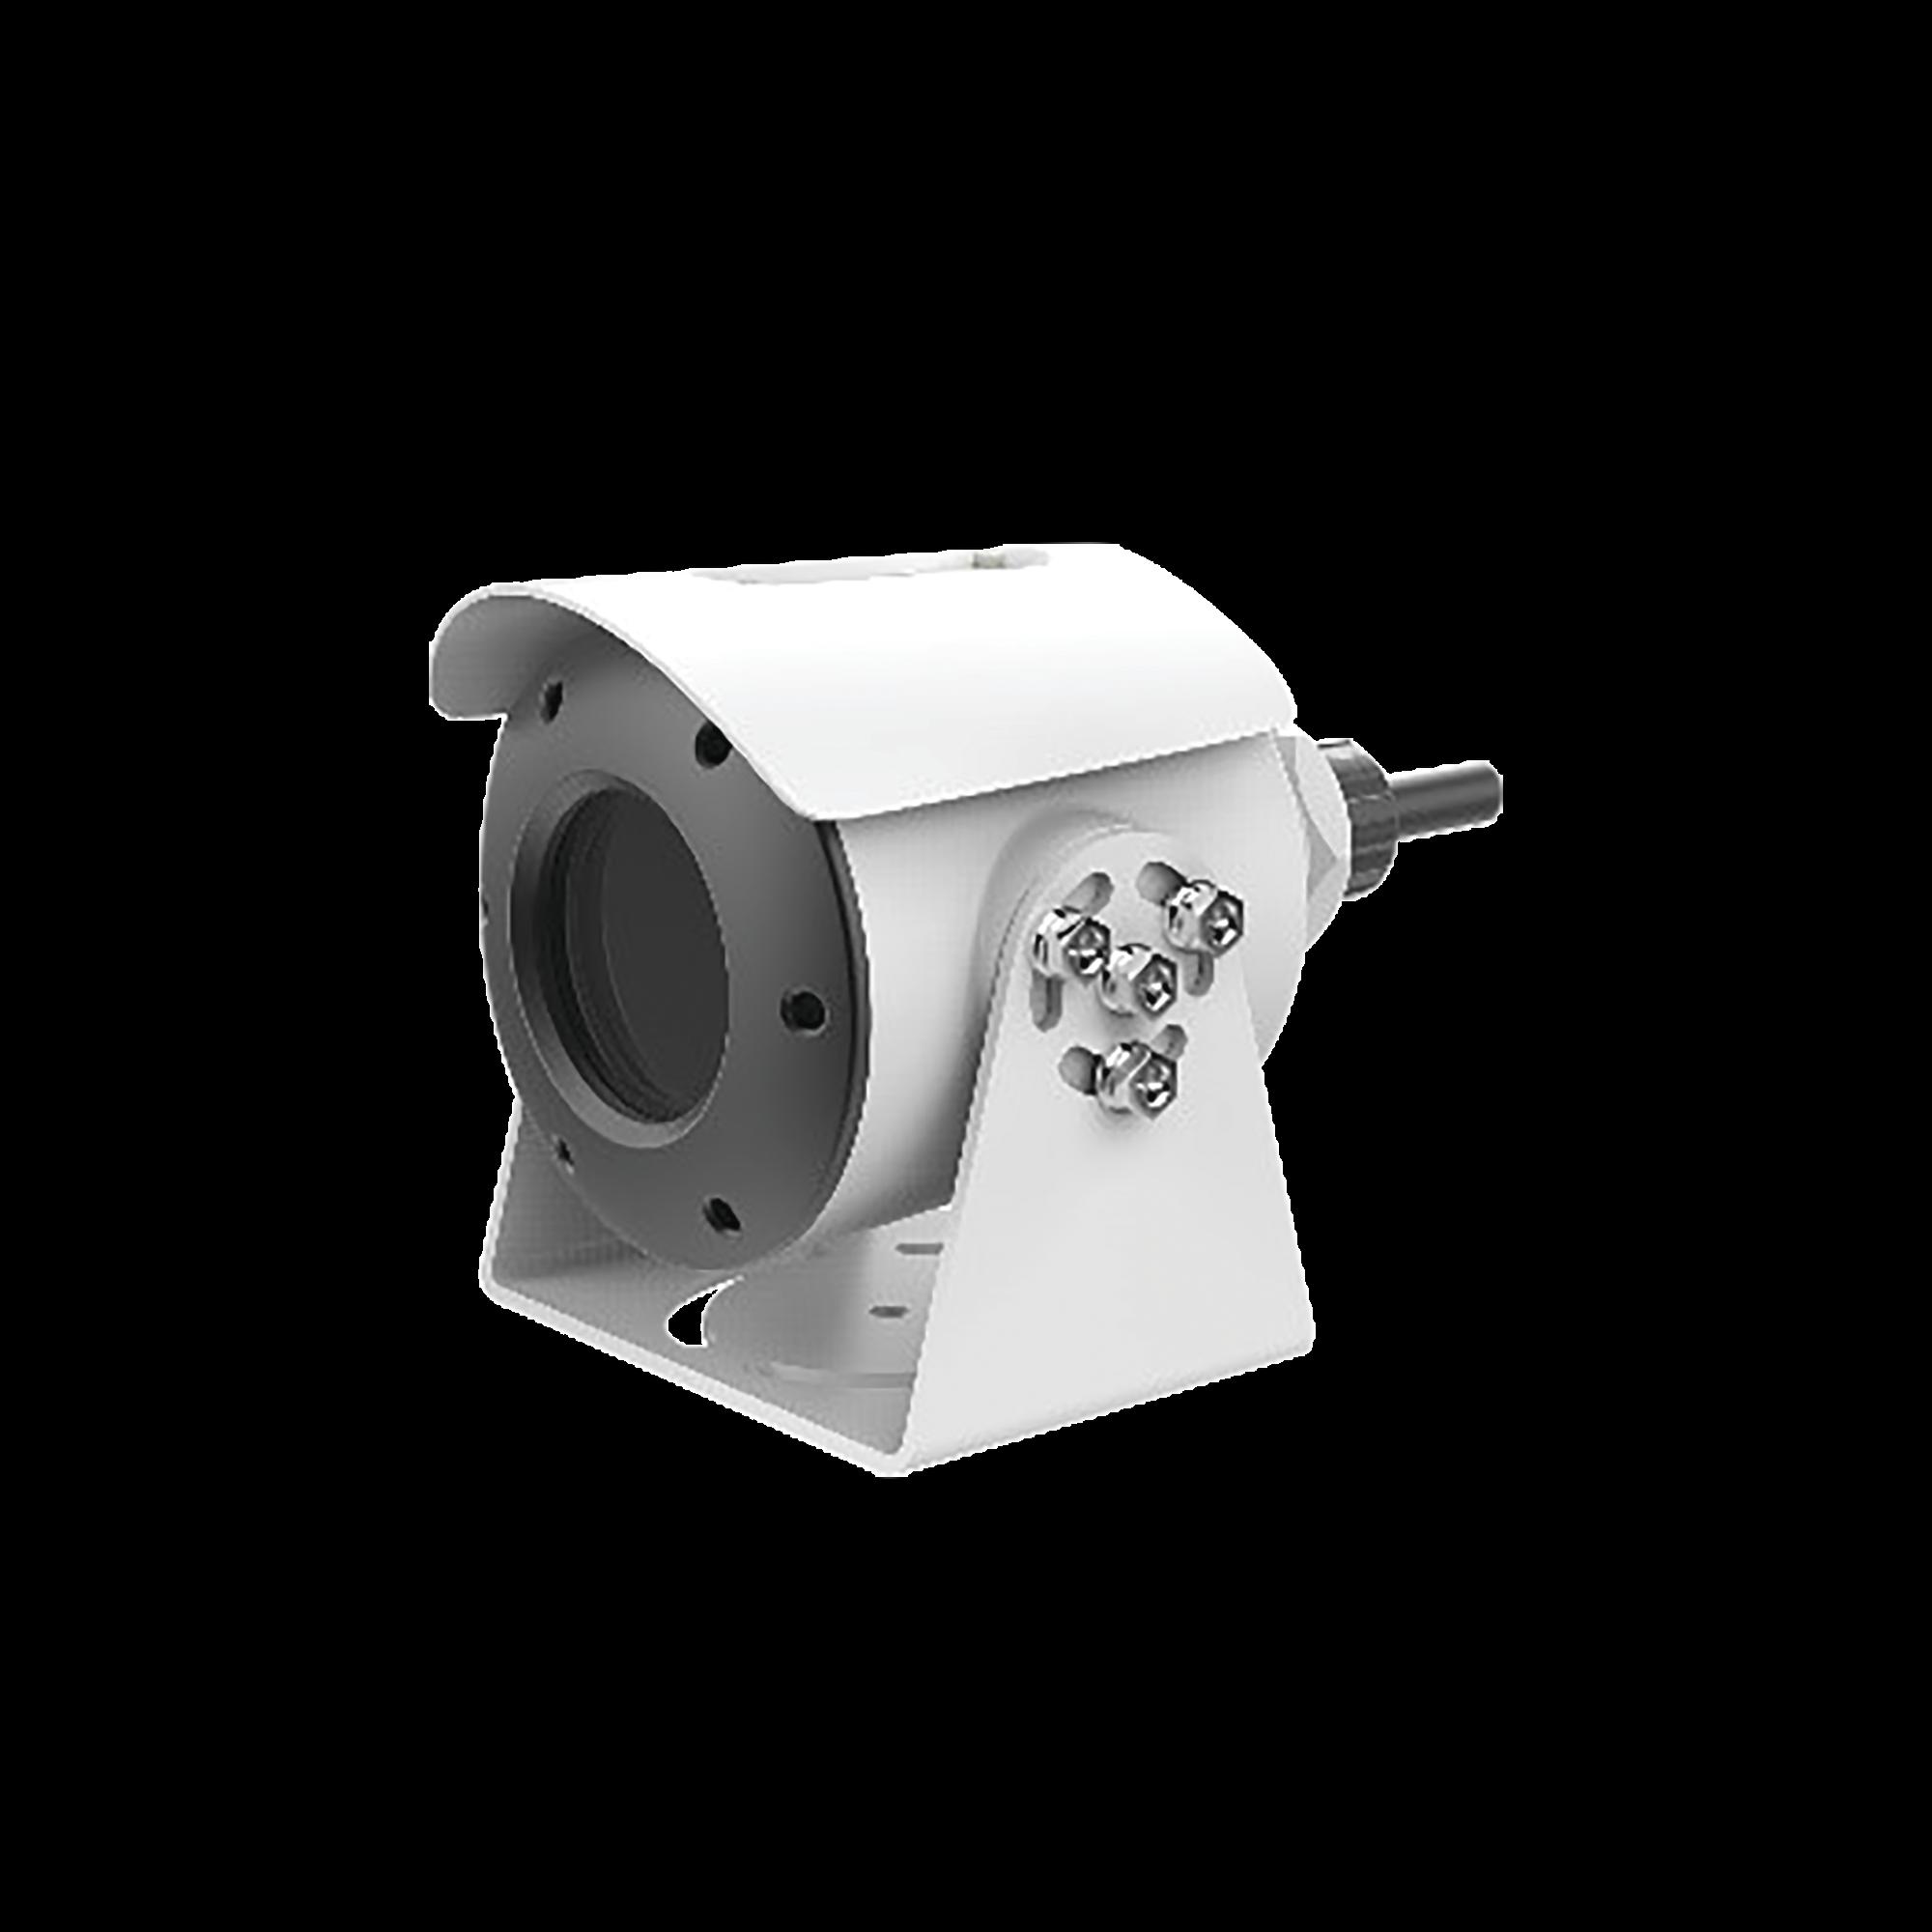 Bala IP 2 Megapixel / Anti-Explosión / Lente 4 mm / 30 mts IR / WDR 120 dB / IP68 / IK08 / Onvif / PoE / Ultra Baja Iluminación